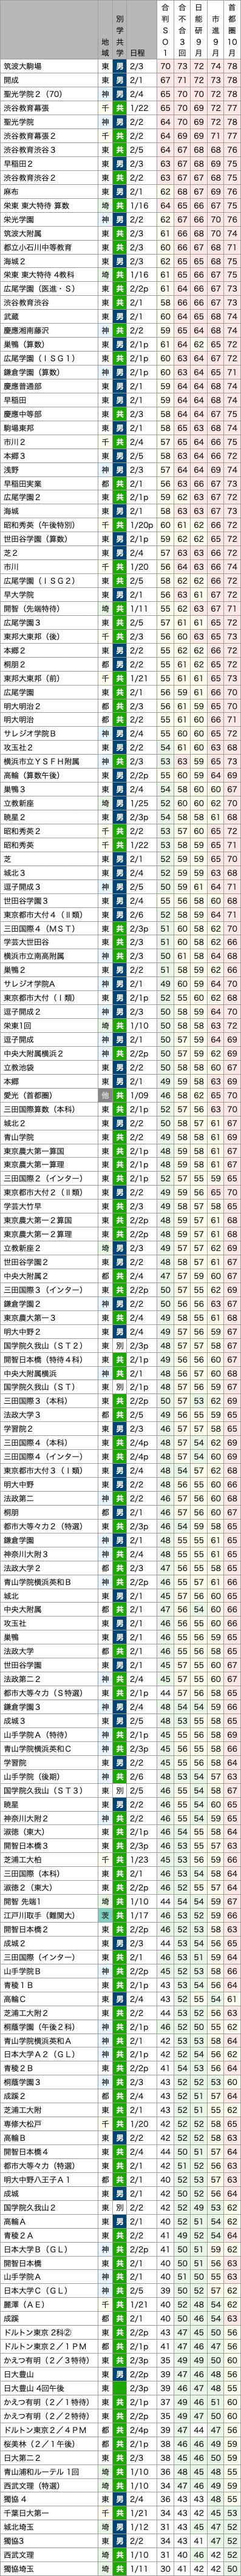 https://e-tutor.tokyo/data/202010m.png